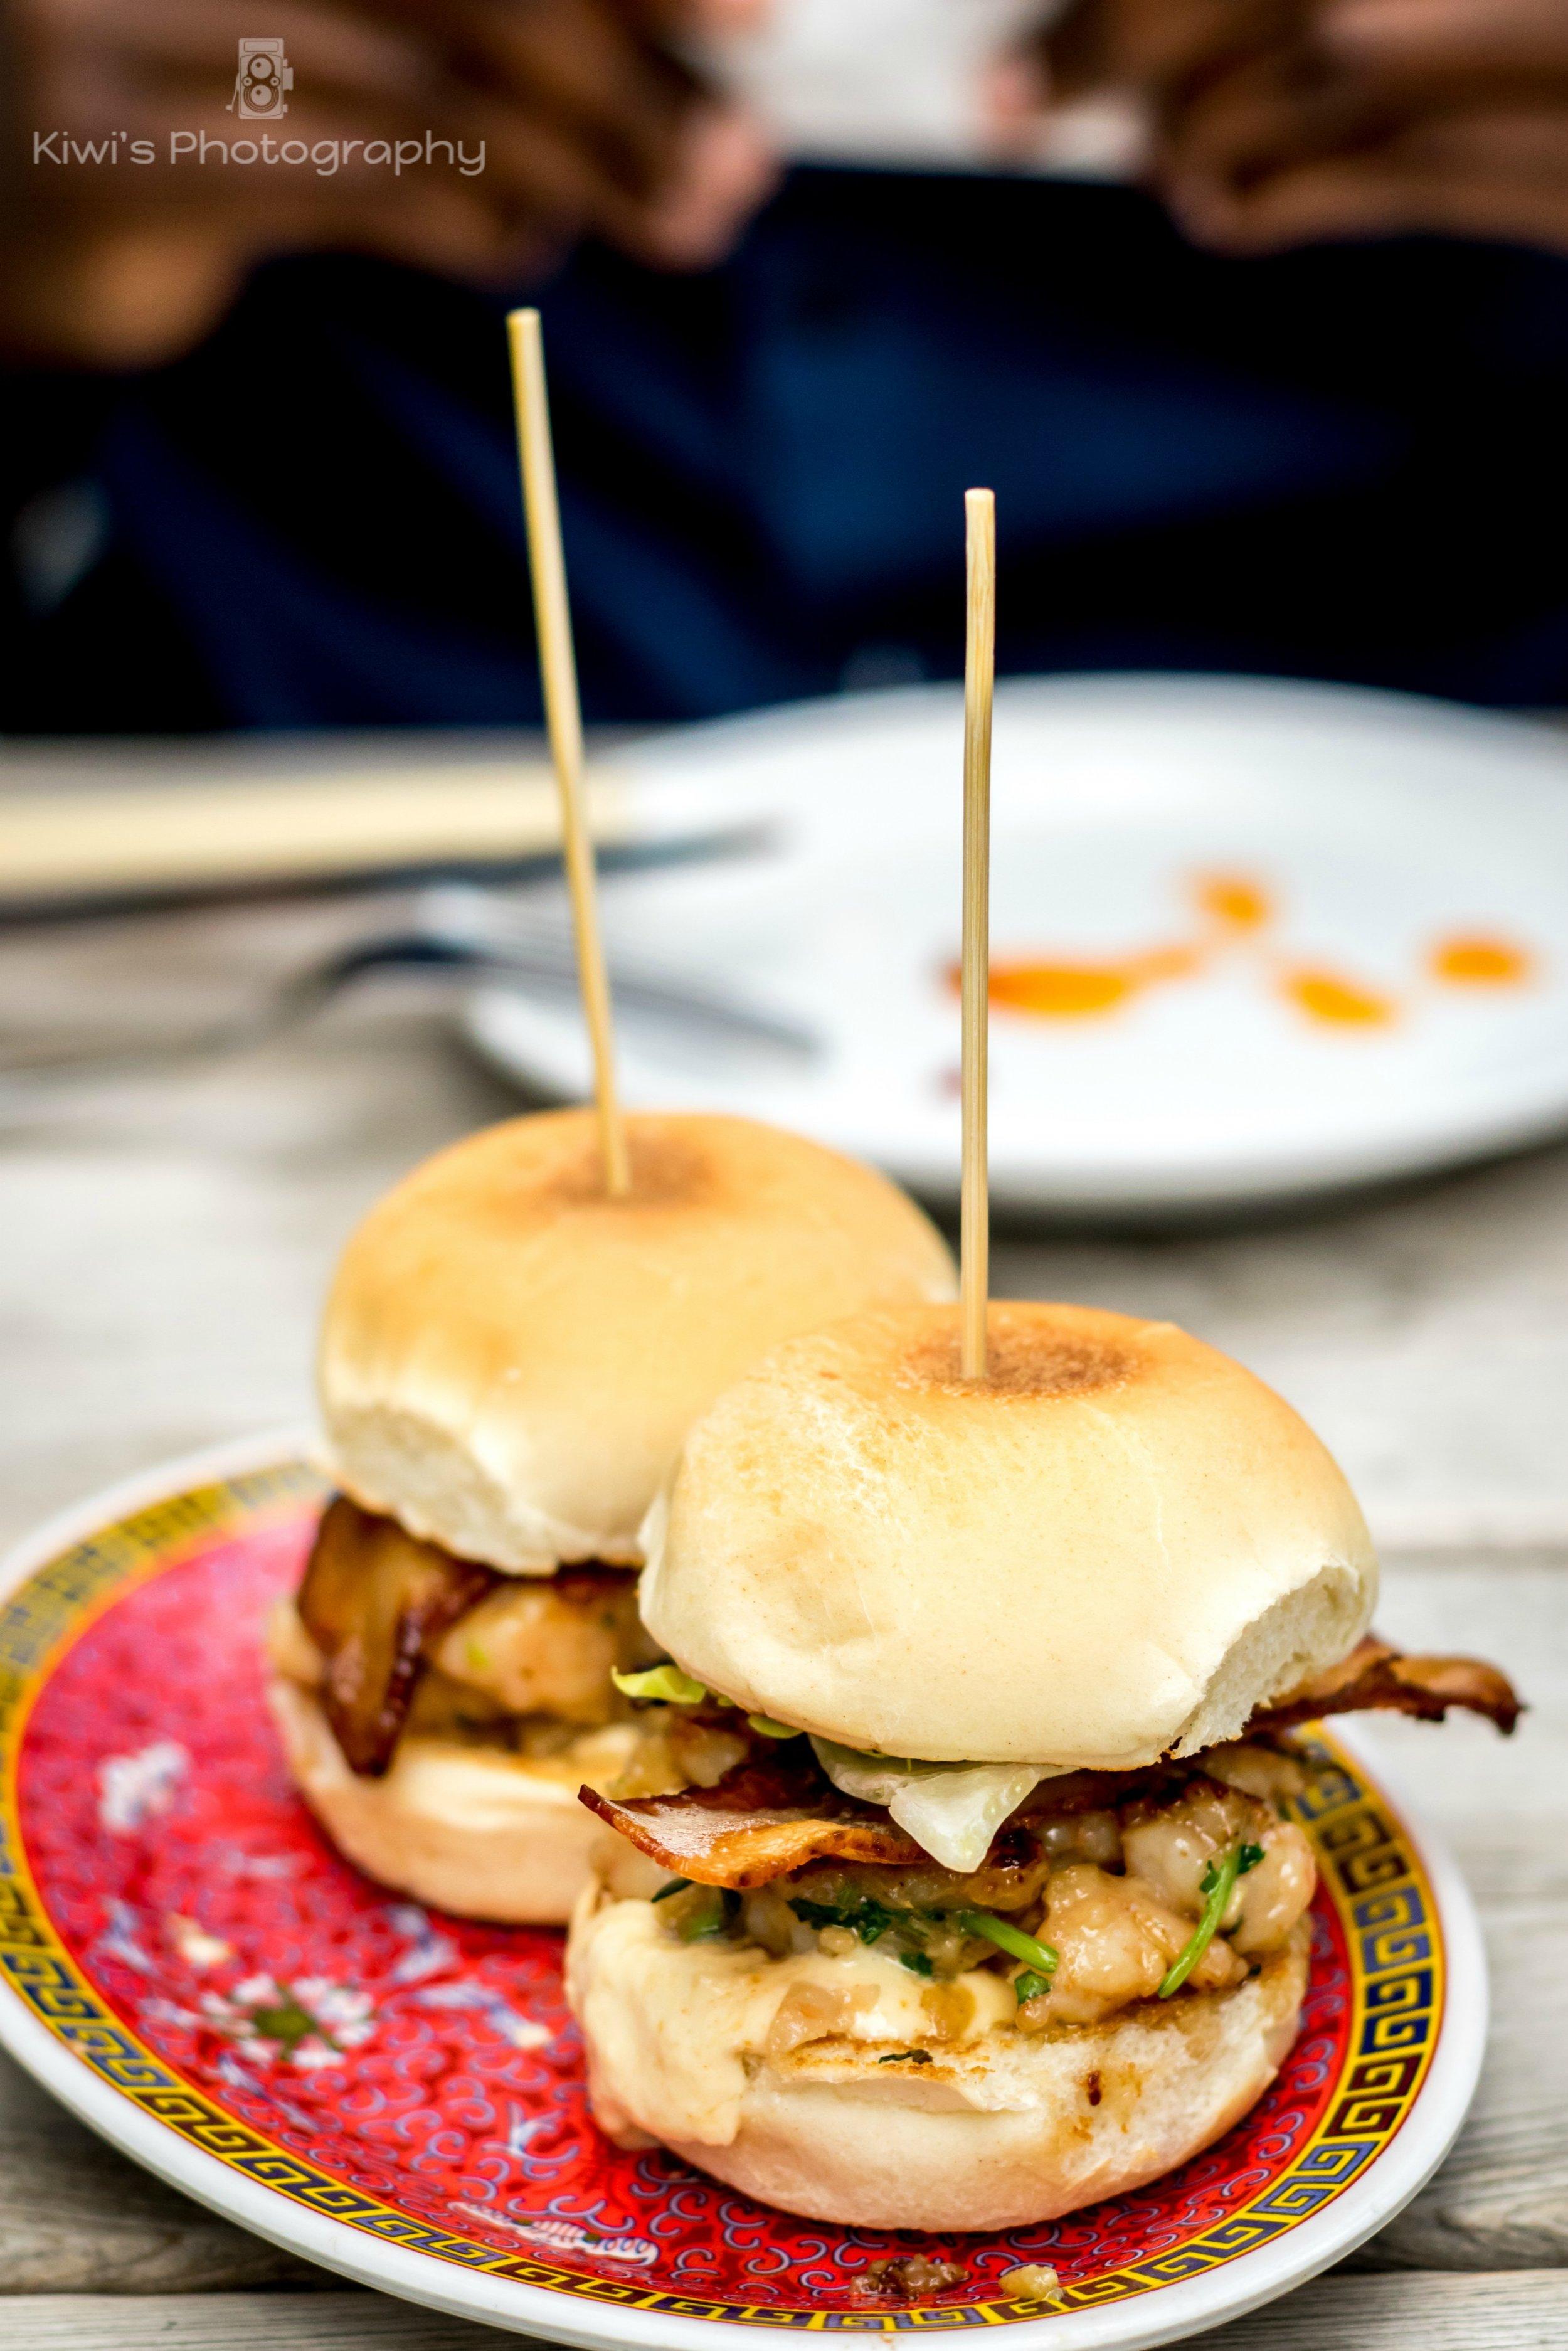 Datsun Ottawa - Shrimp Burgers with Bacon, Lettuce, Tasty Sauce & Toastie Bun